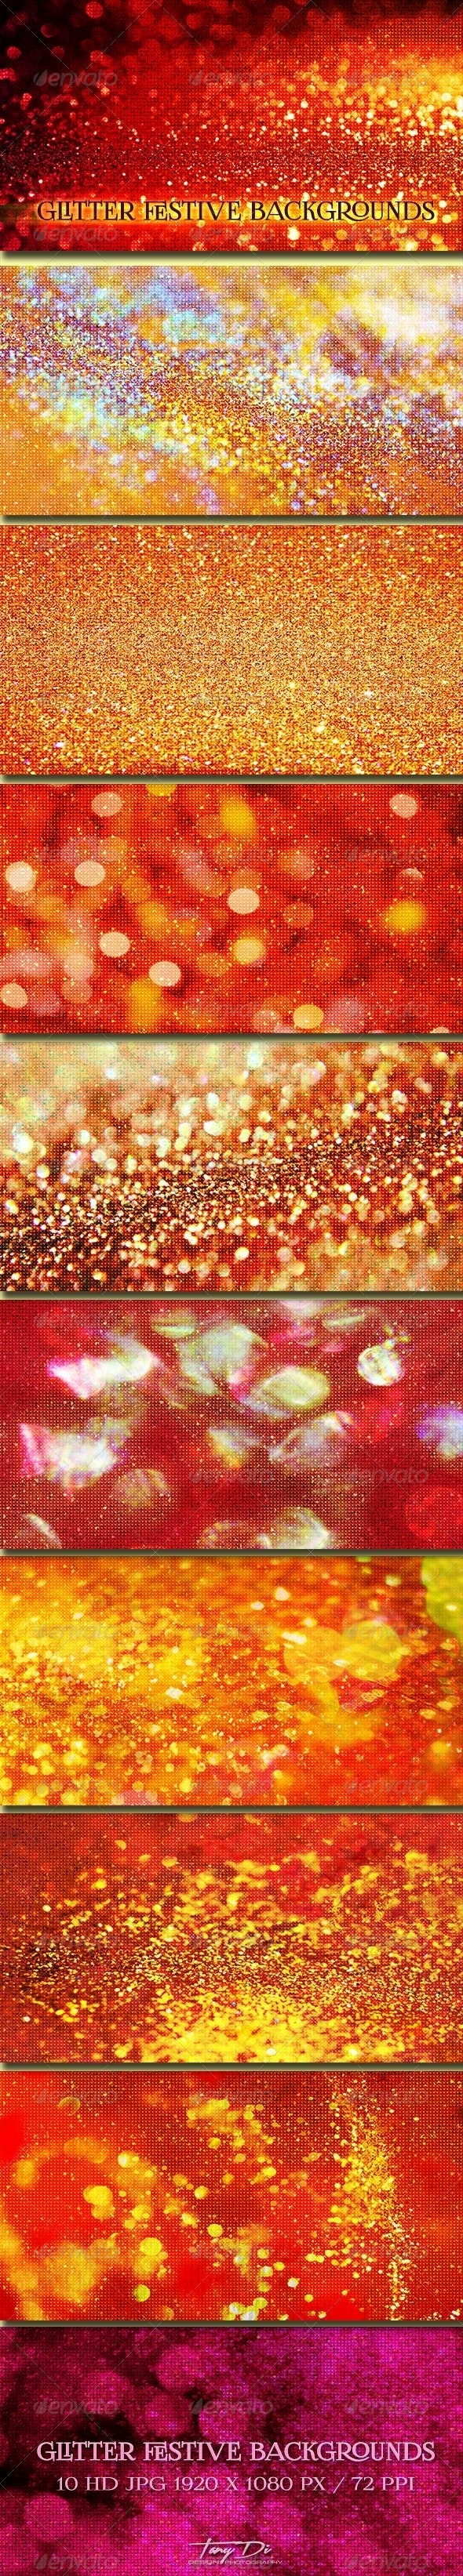 Glitter Festive Backgrounds - Miscellaneous Backgrounds